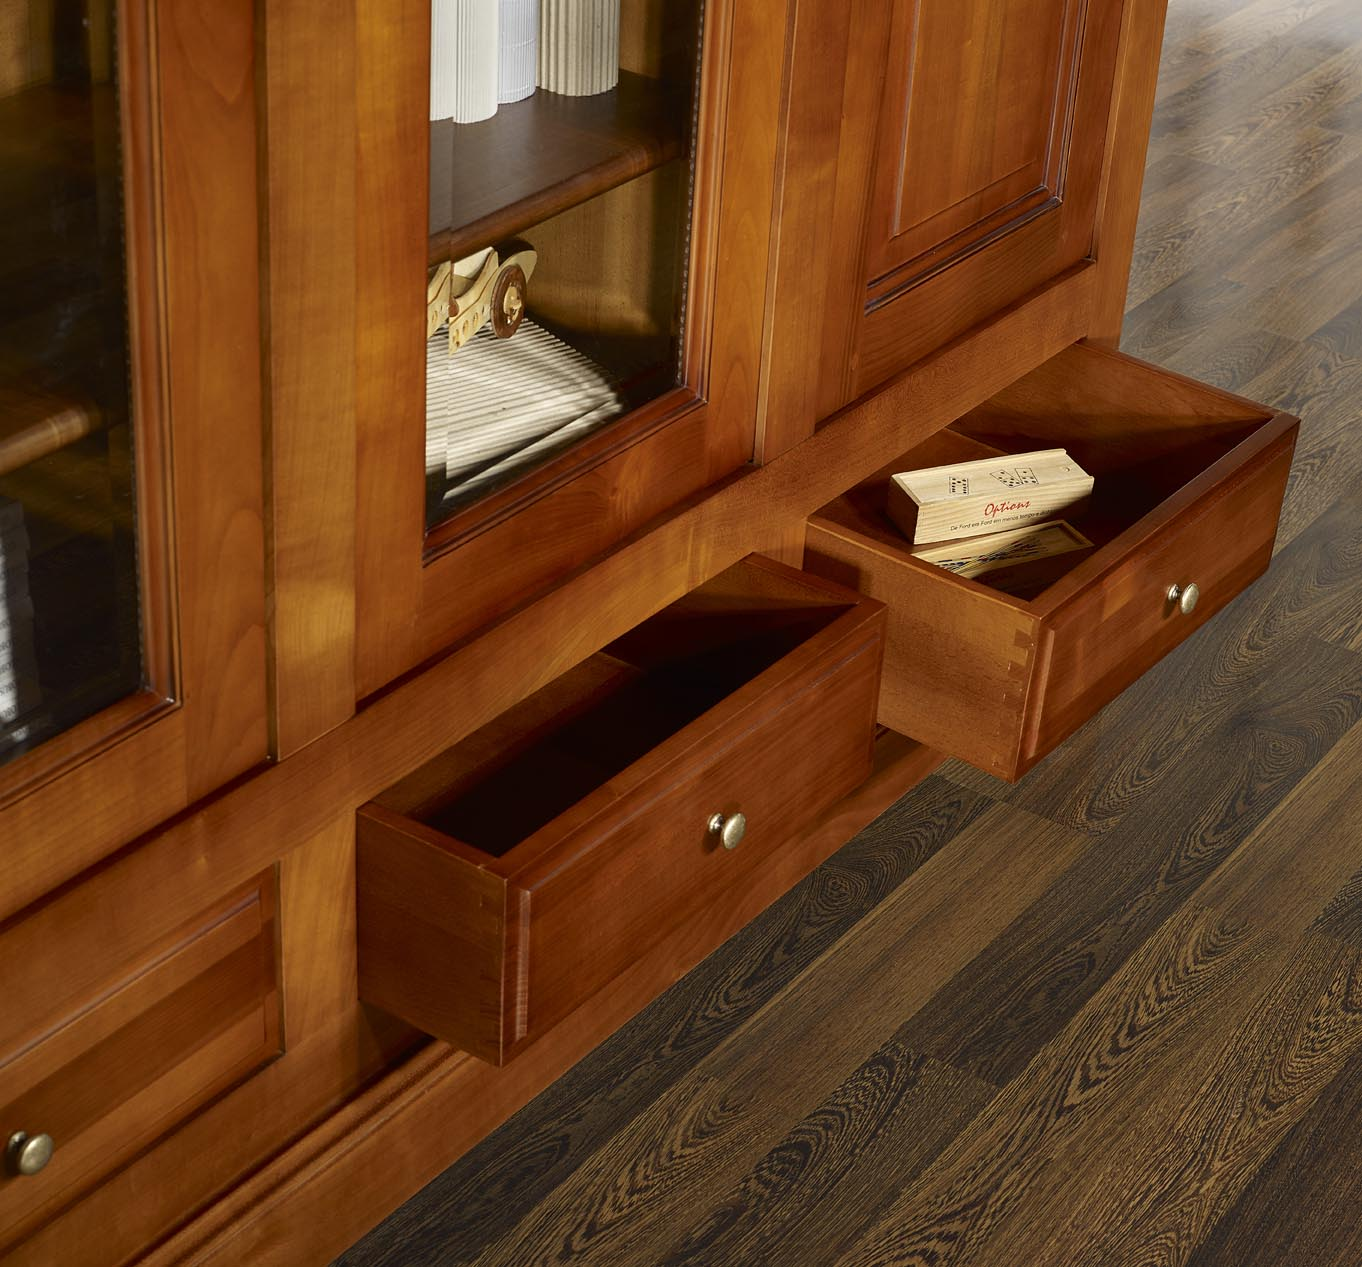 biblioth que 4 portes in s en merisier massif de style louis philippe meuble en merisier. Black Bedroom Furniture Sets. Home Design Ideas